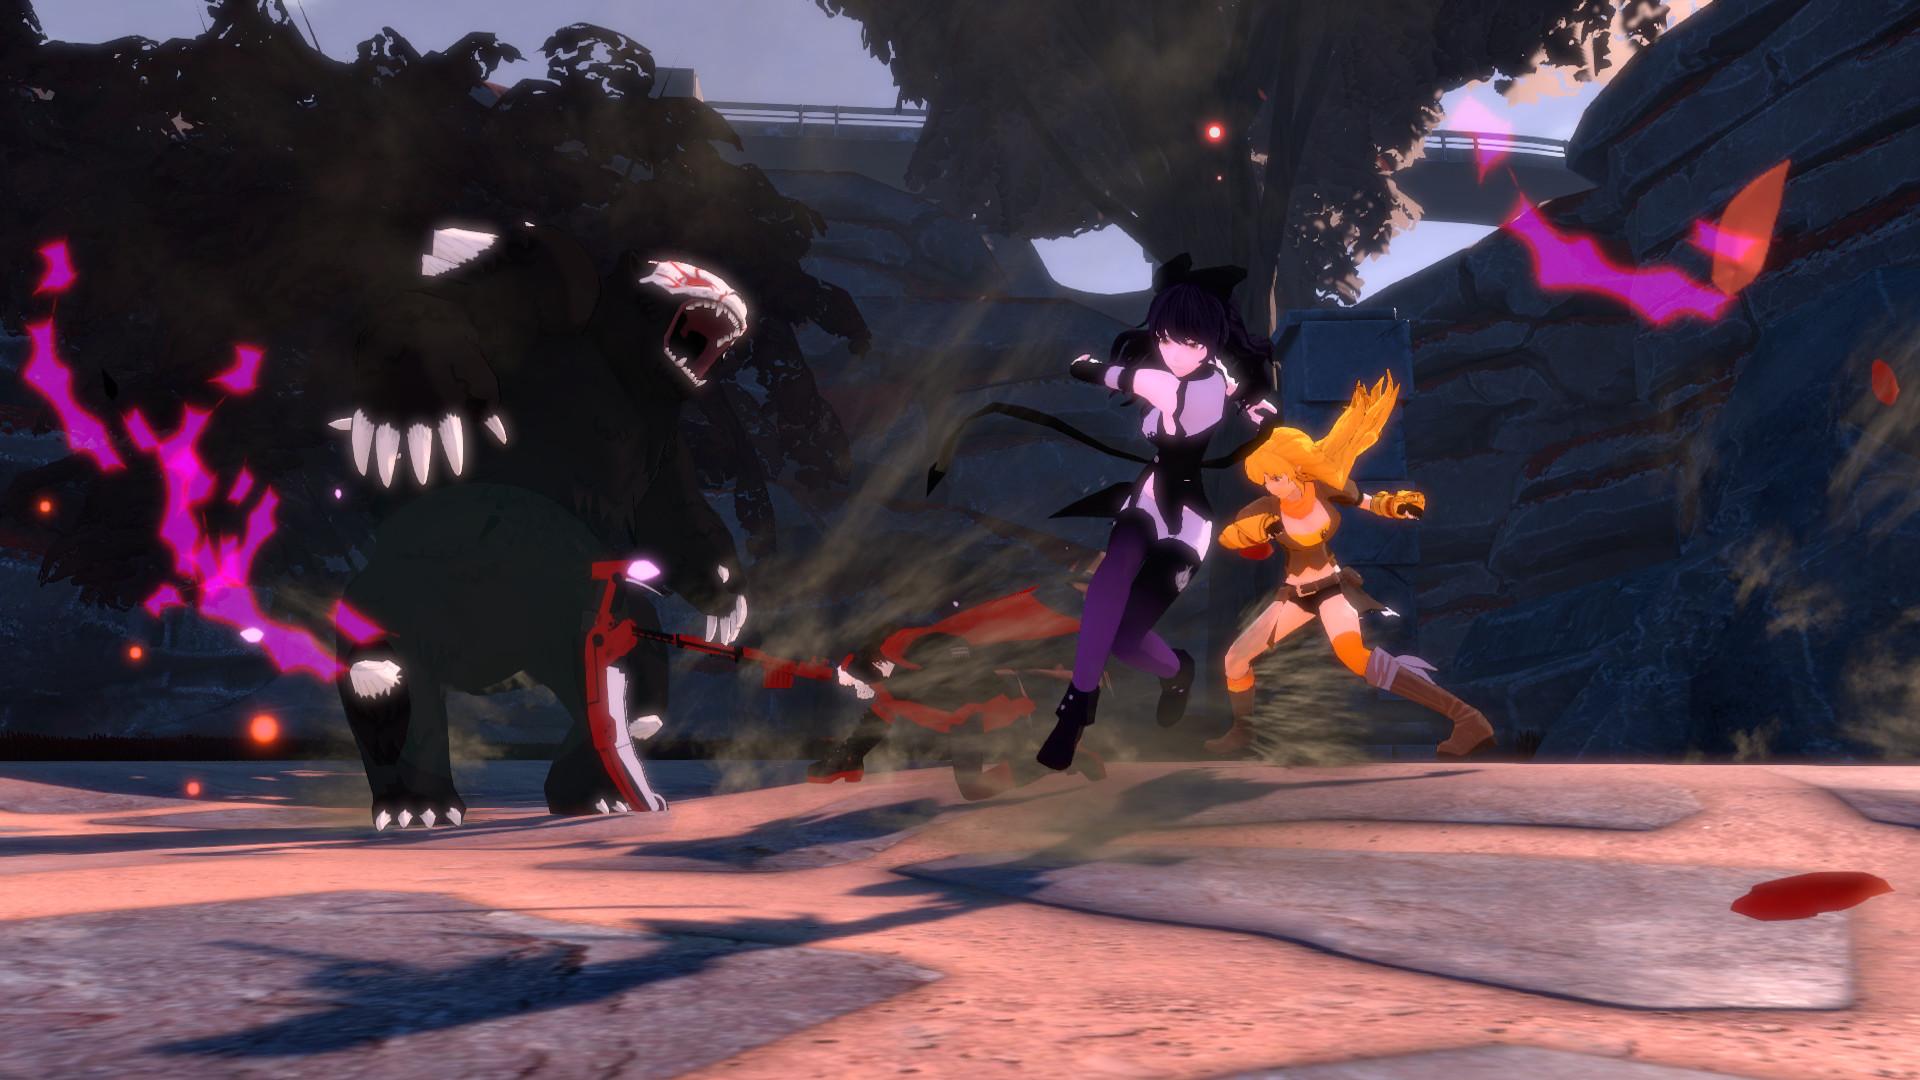 RWBY: Grimm Eclipse Screenshot 3